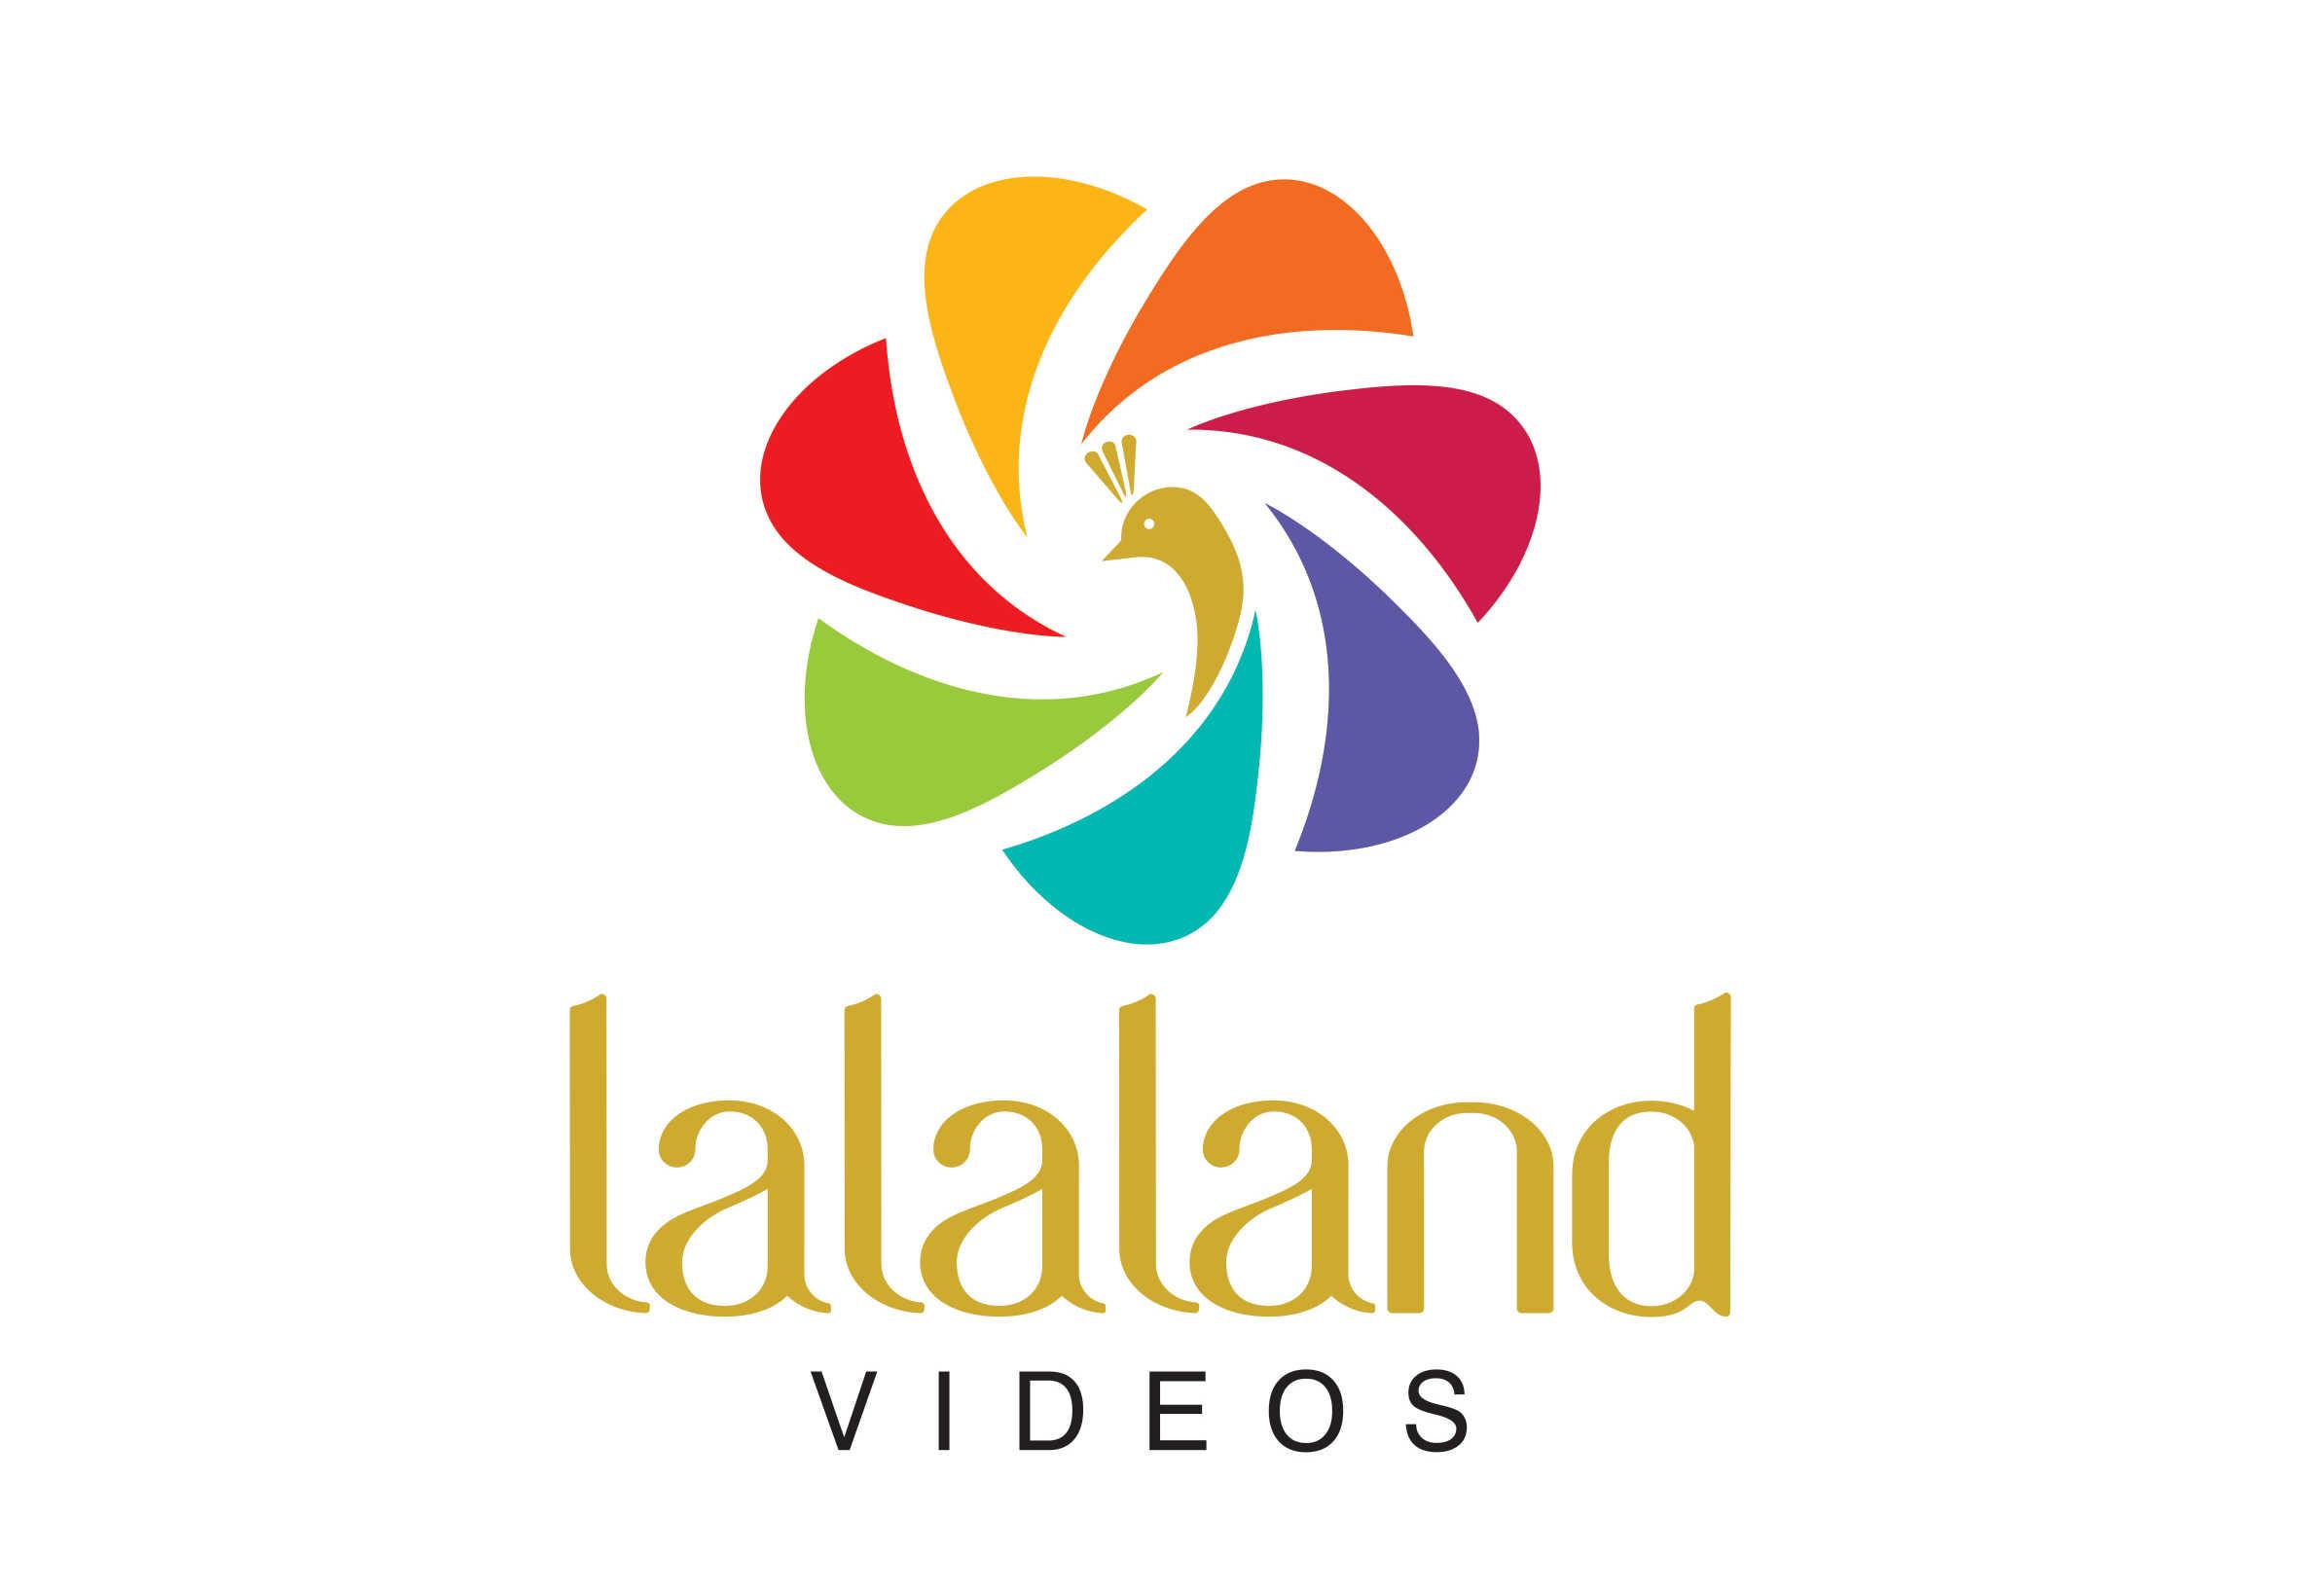 LALALAND VIDEOS